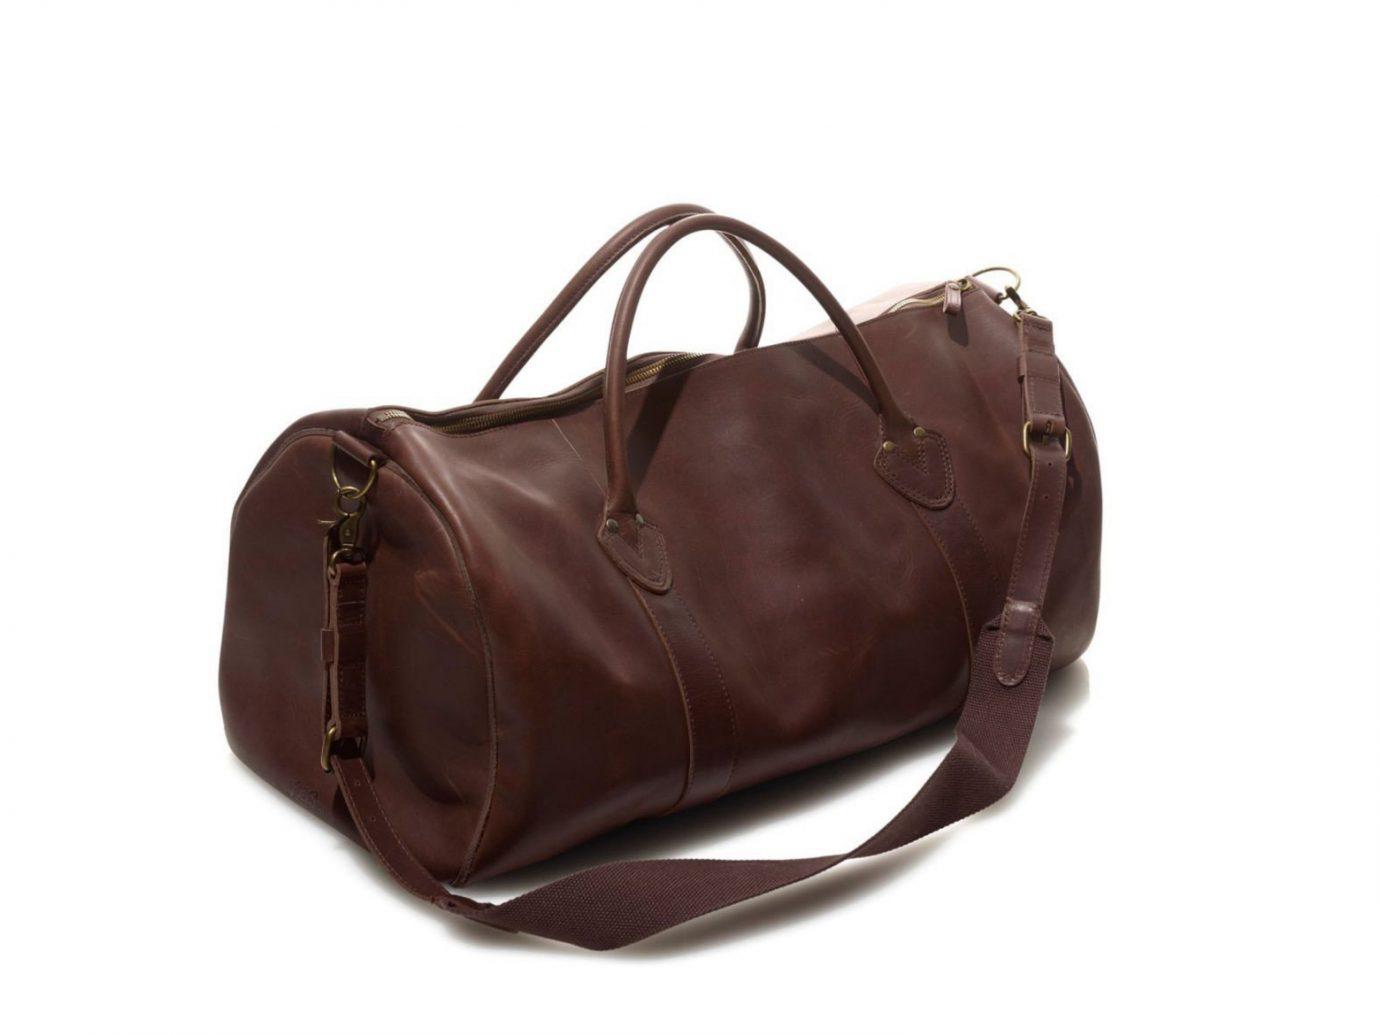 Gift Guides Style + Design Travel Shop bag brown leather indoor shoulder bag handbag fashion accessory black piece product caramel color accessory shoes strap product design